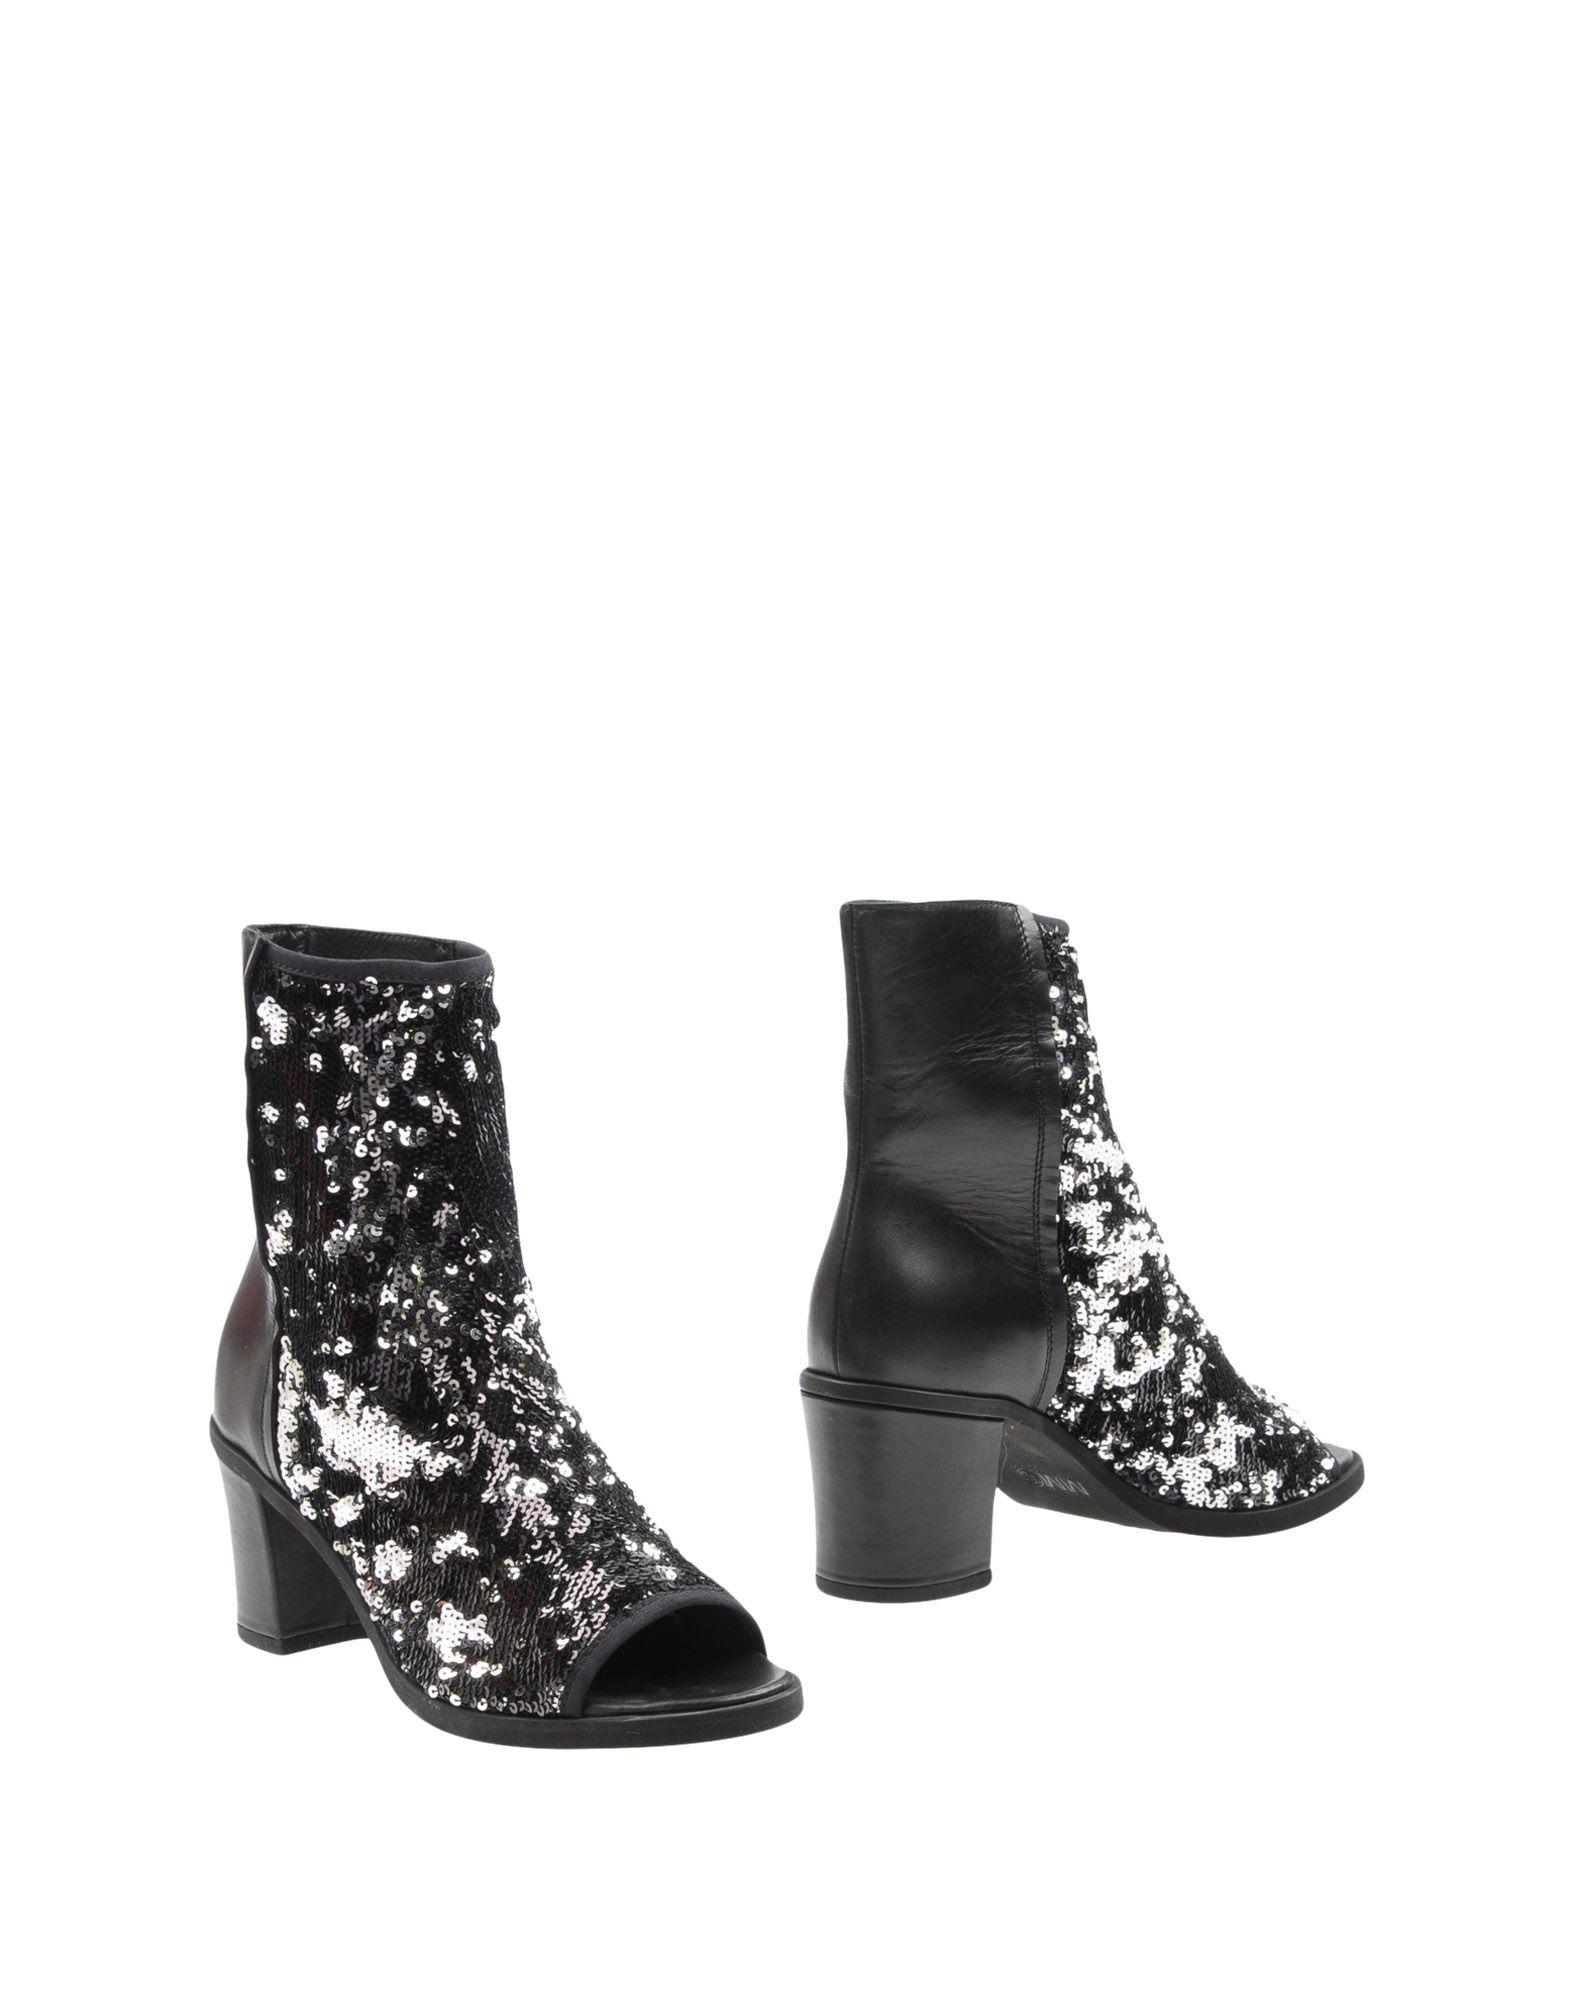 Mm6 Maison Margiela Stiefelette Schuhe Damen  11307757XB Neue Schuhe Stiefelette a0a9b2